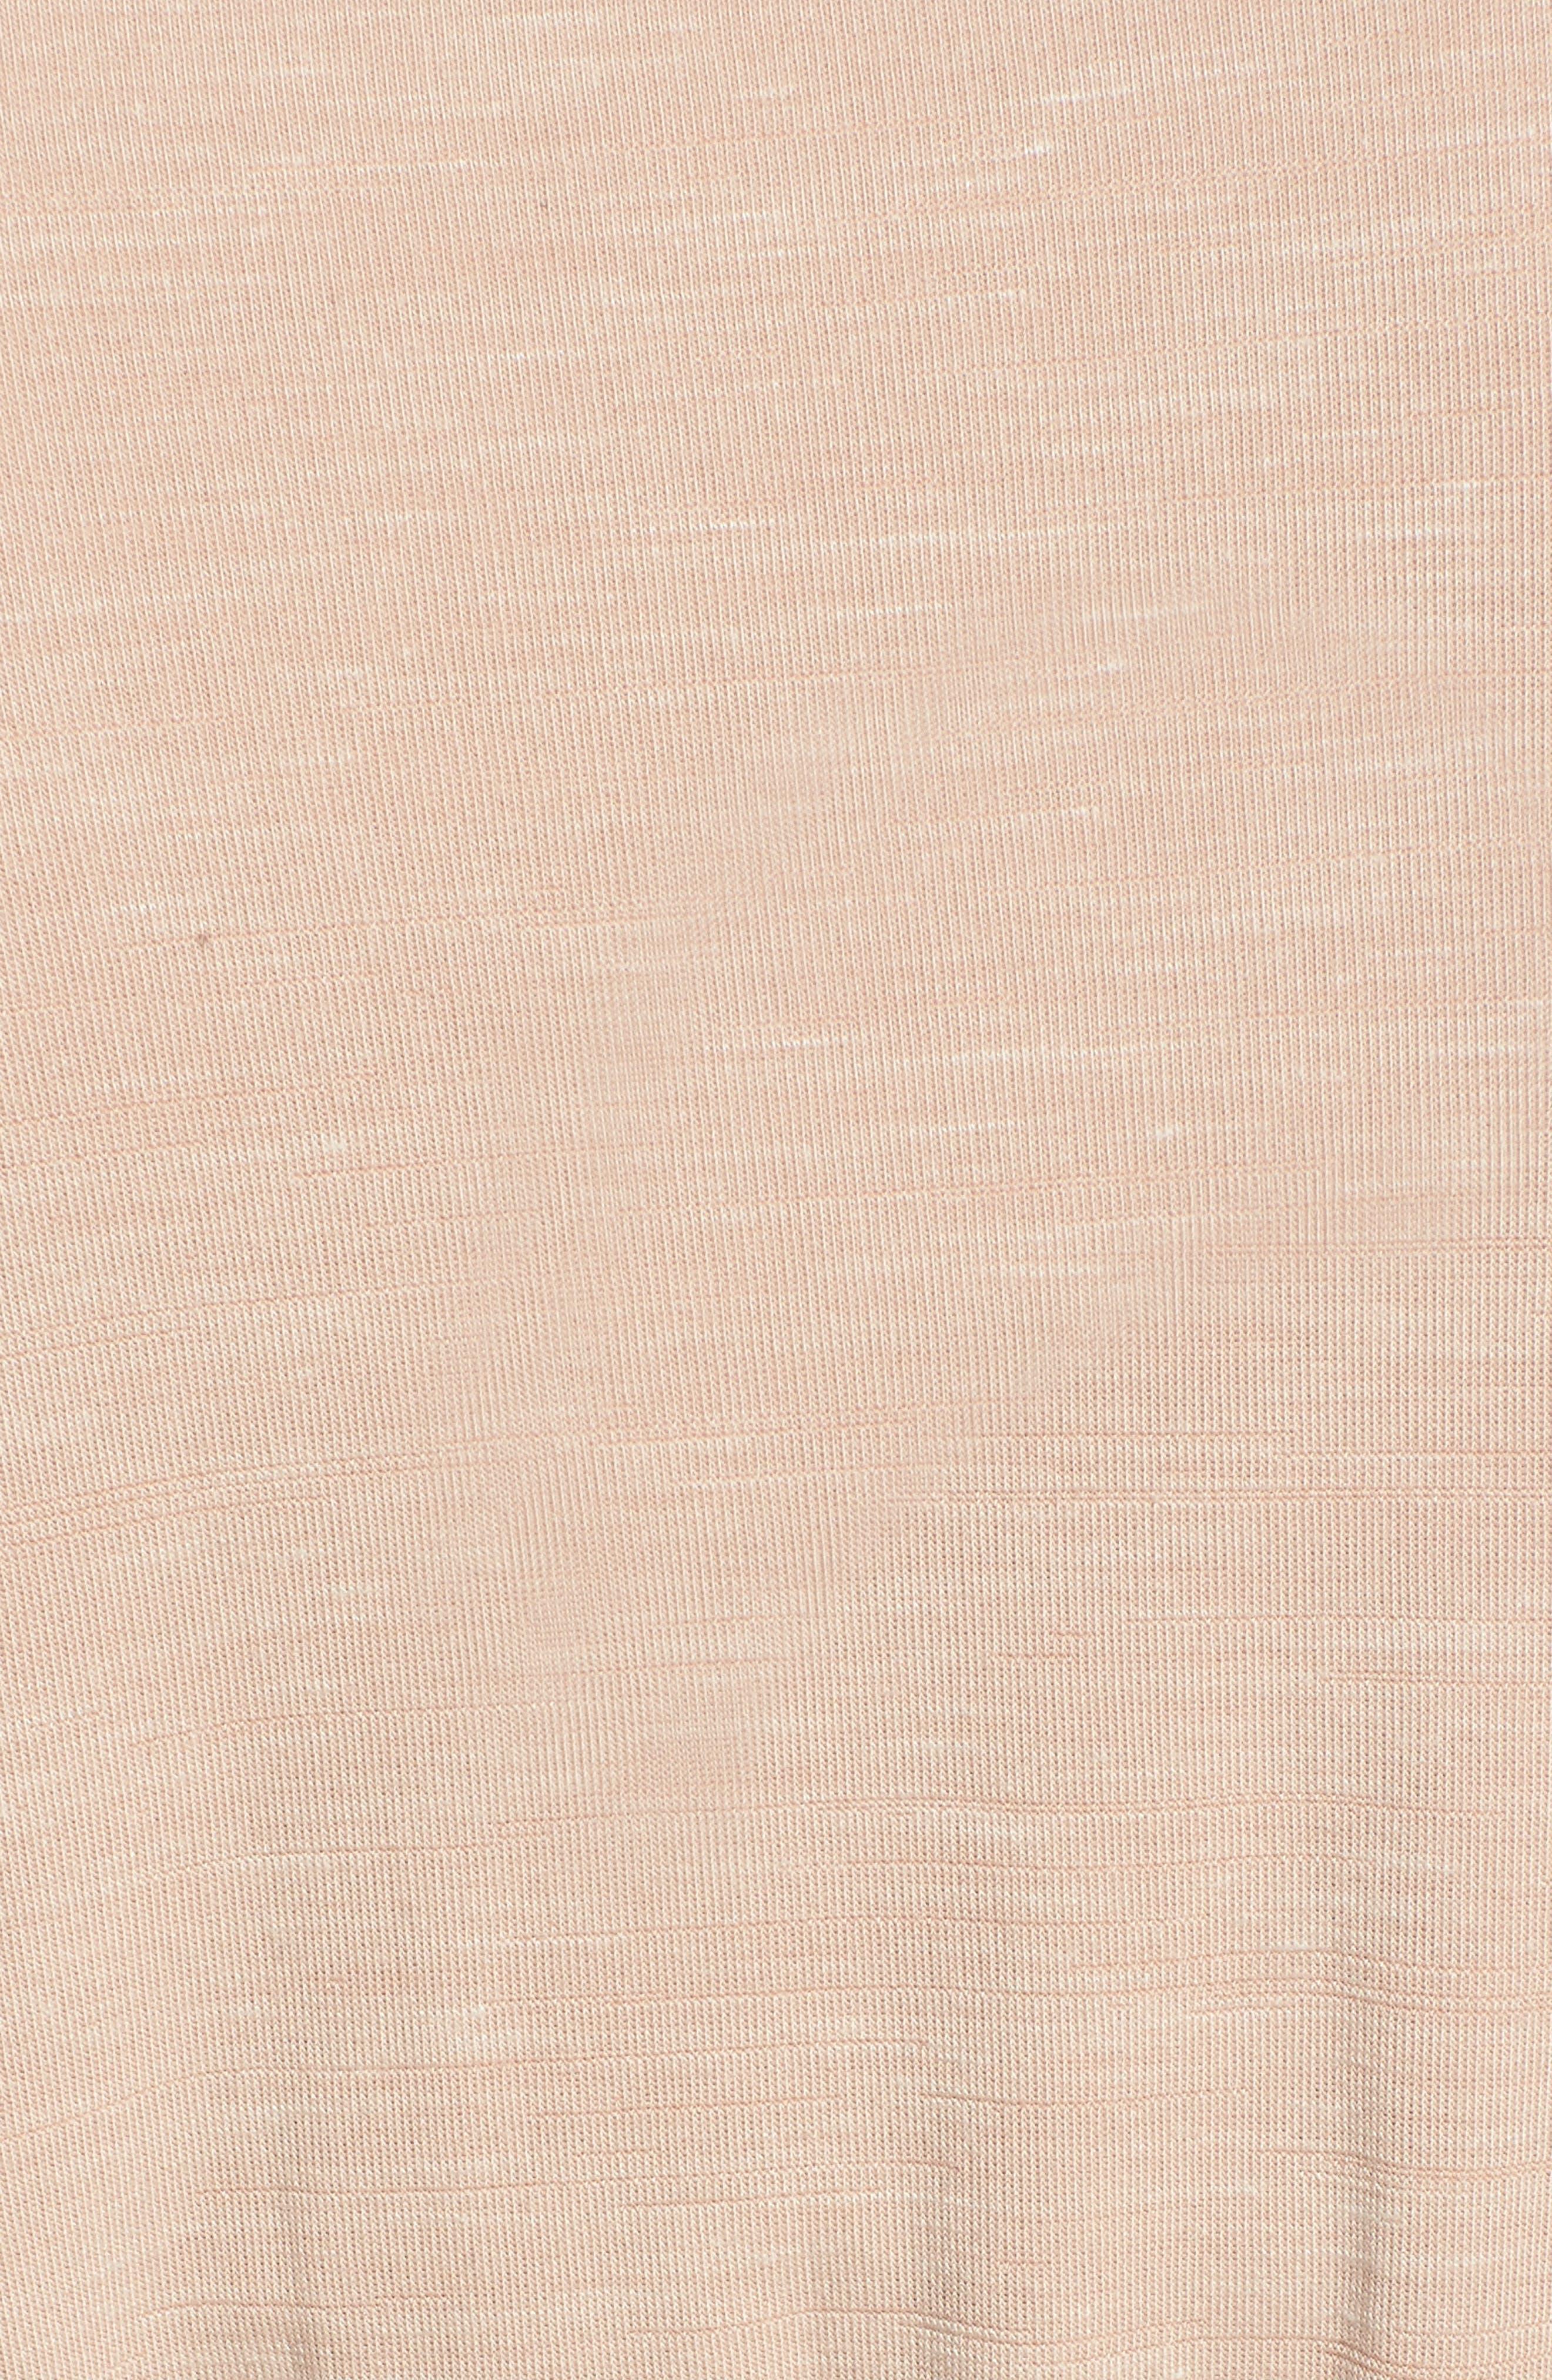 Corset Sweatshirt,                             Alternate thumbnail 5, color,                             680